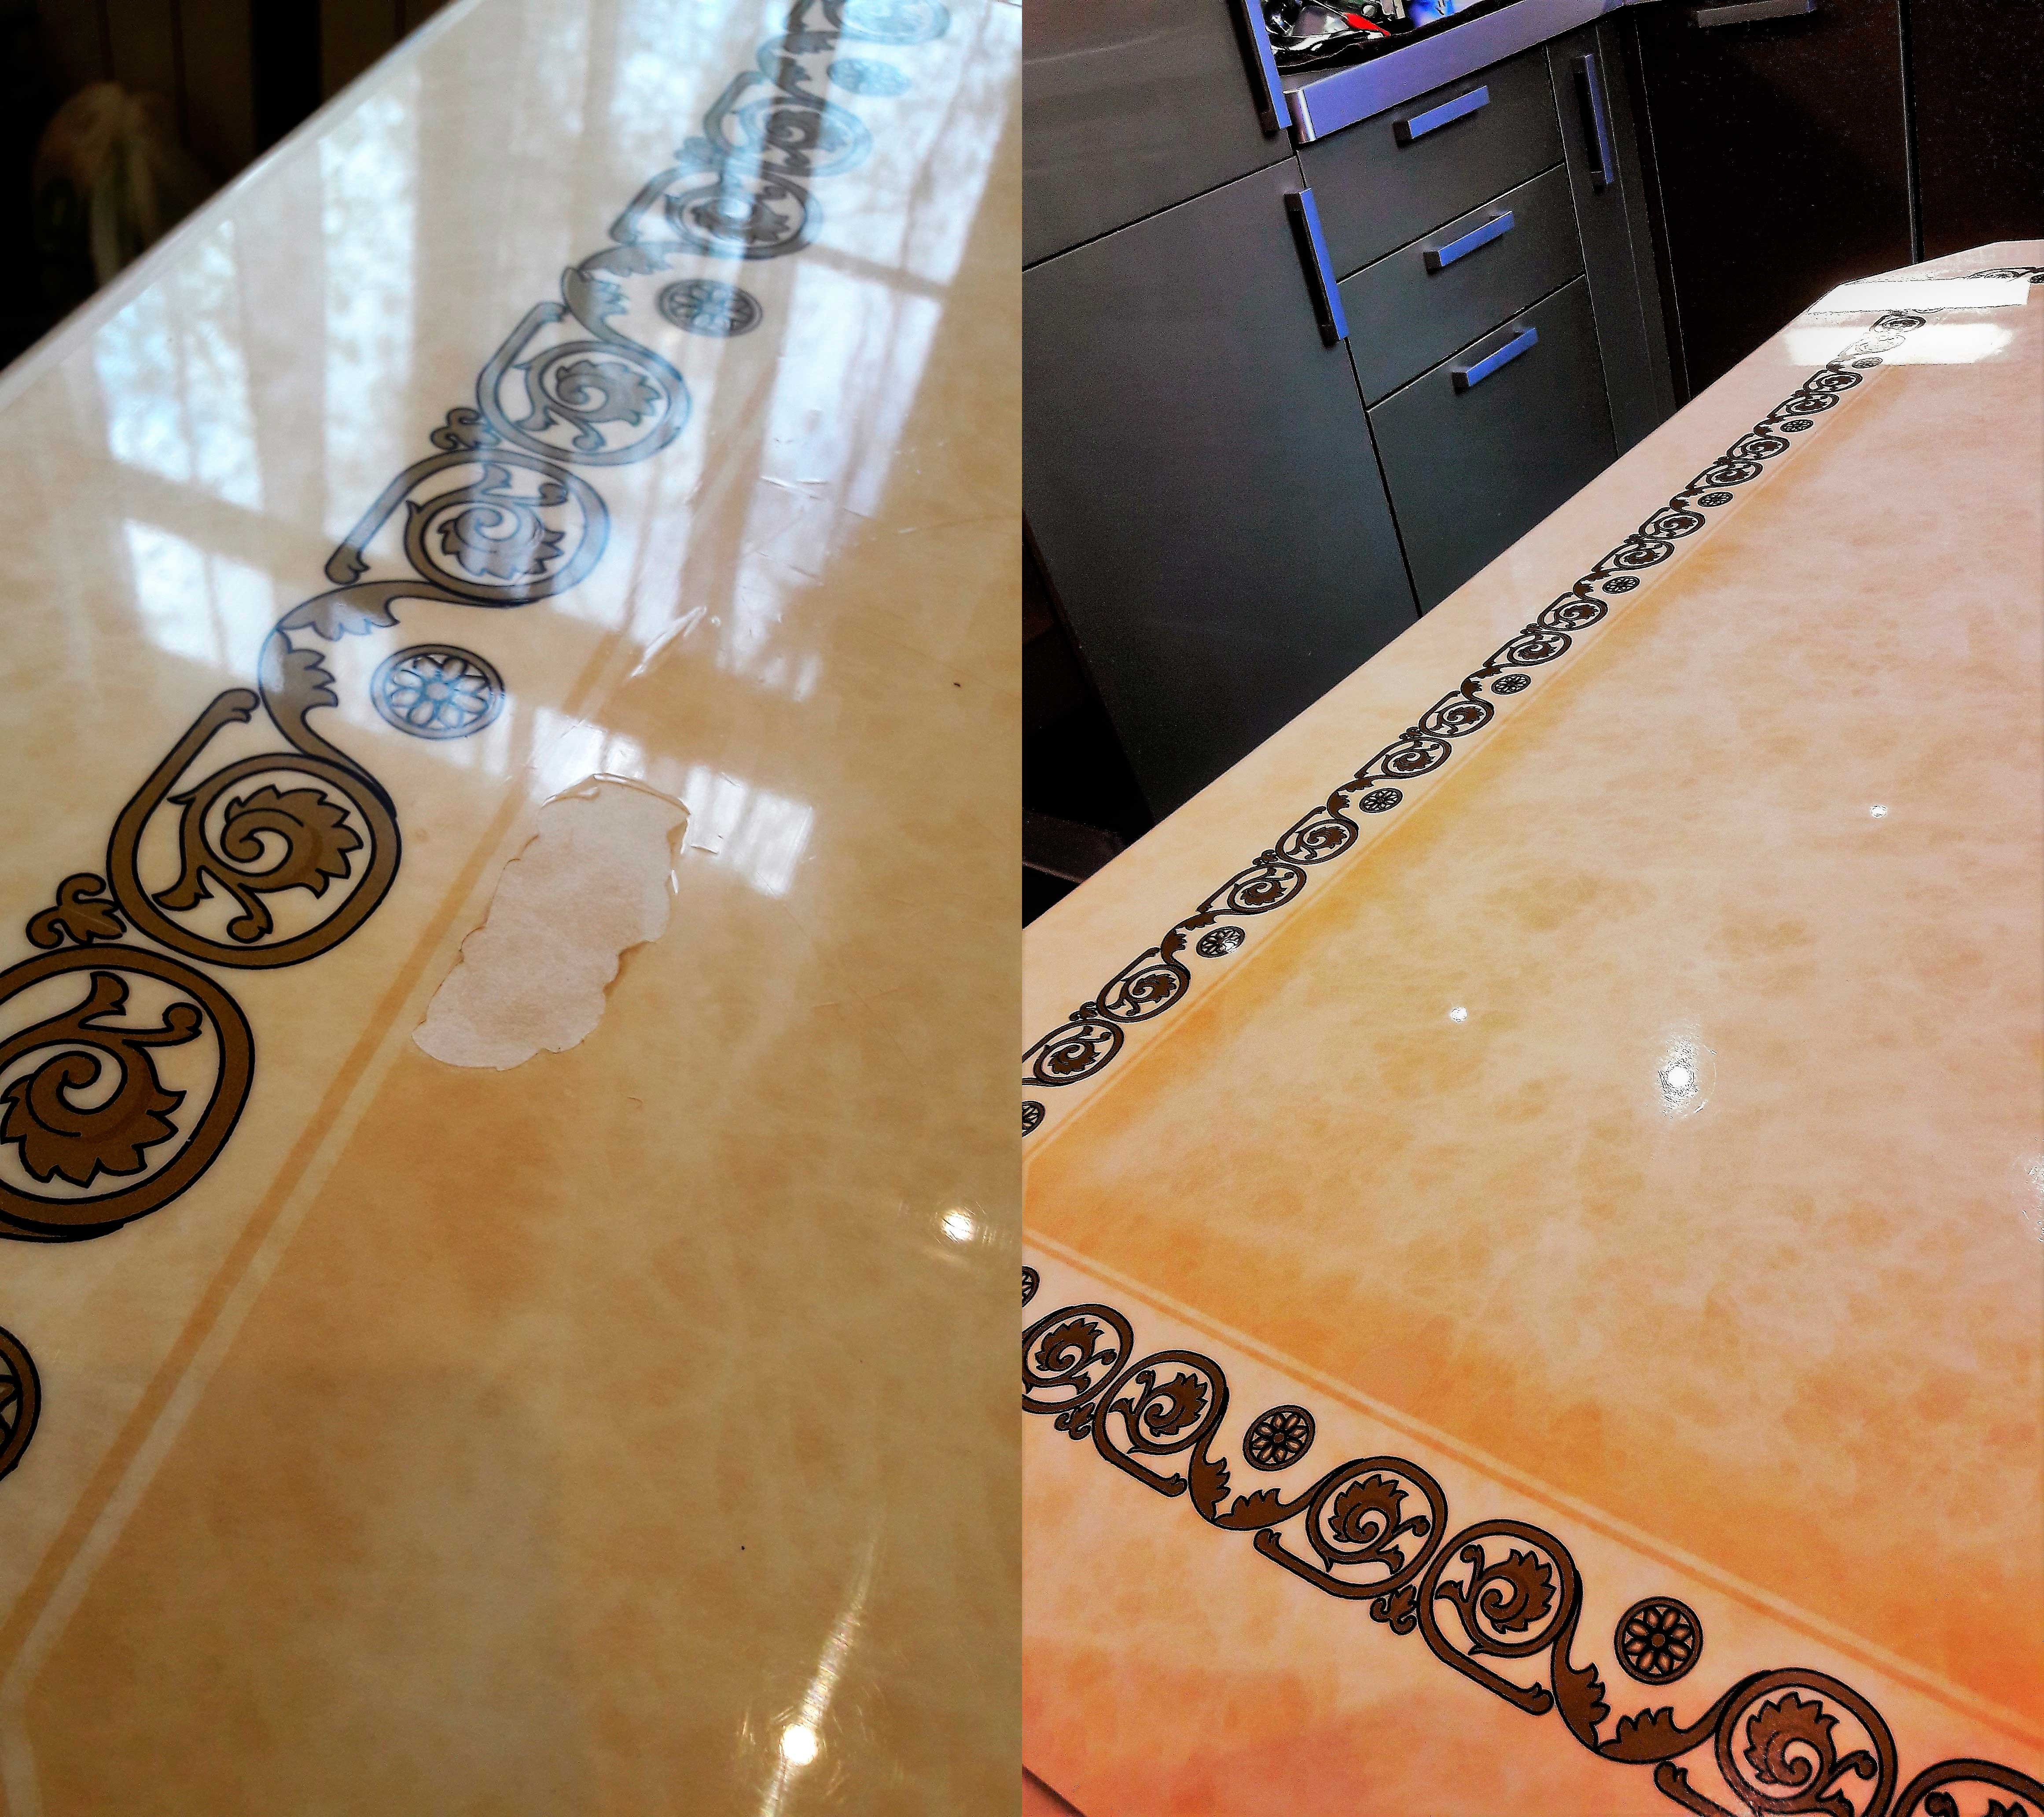 Реставрация пленки пвх стола